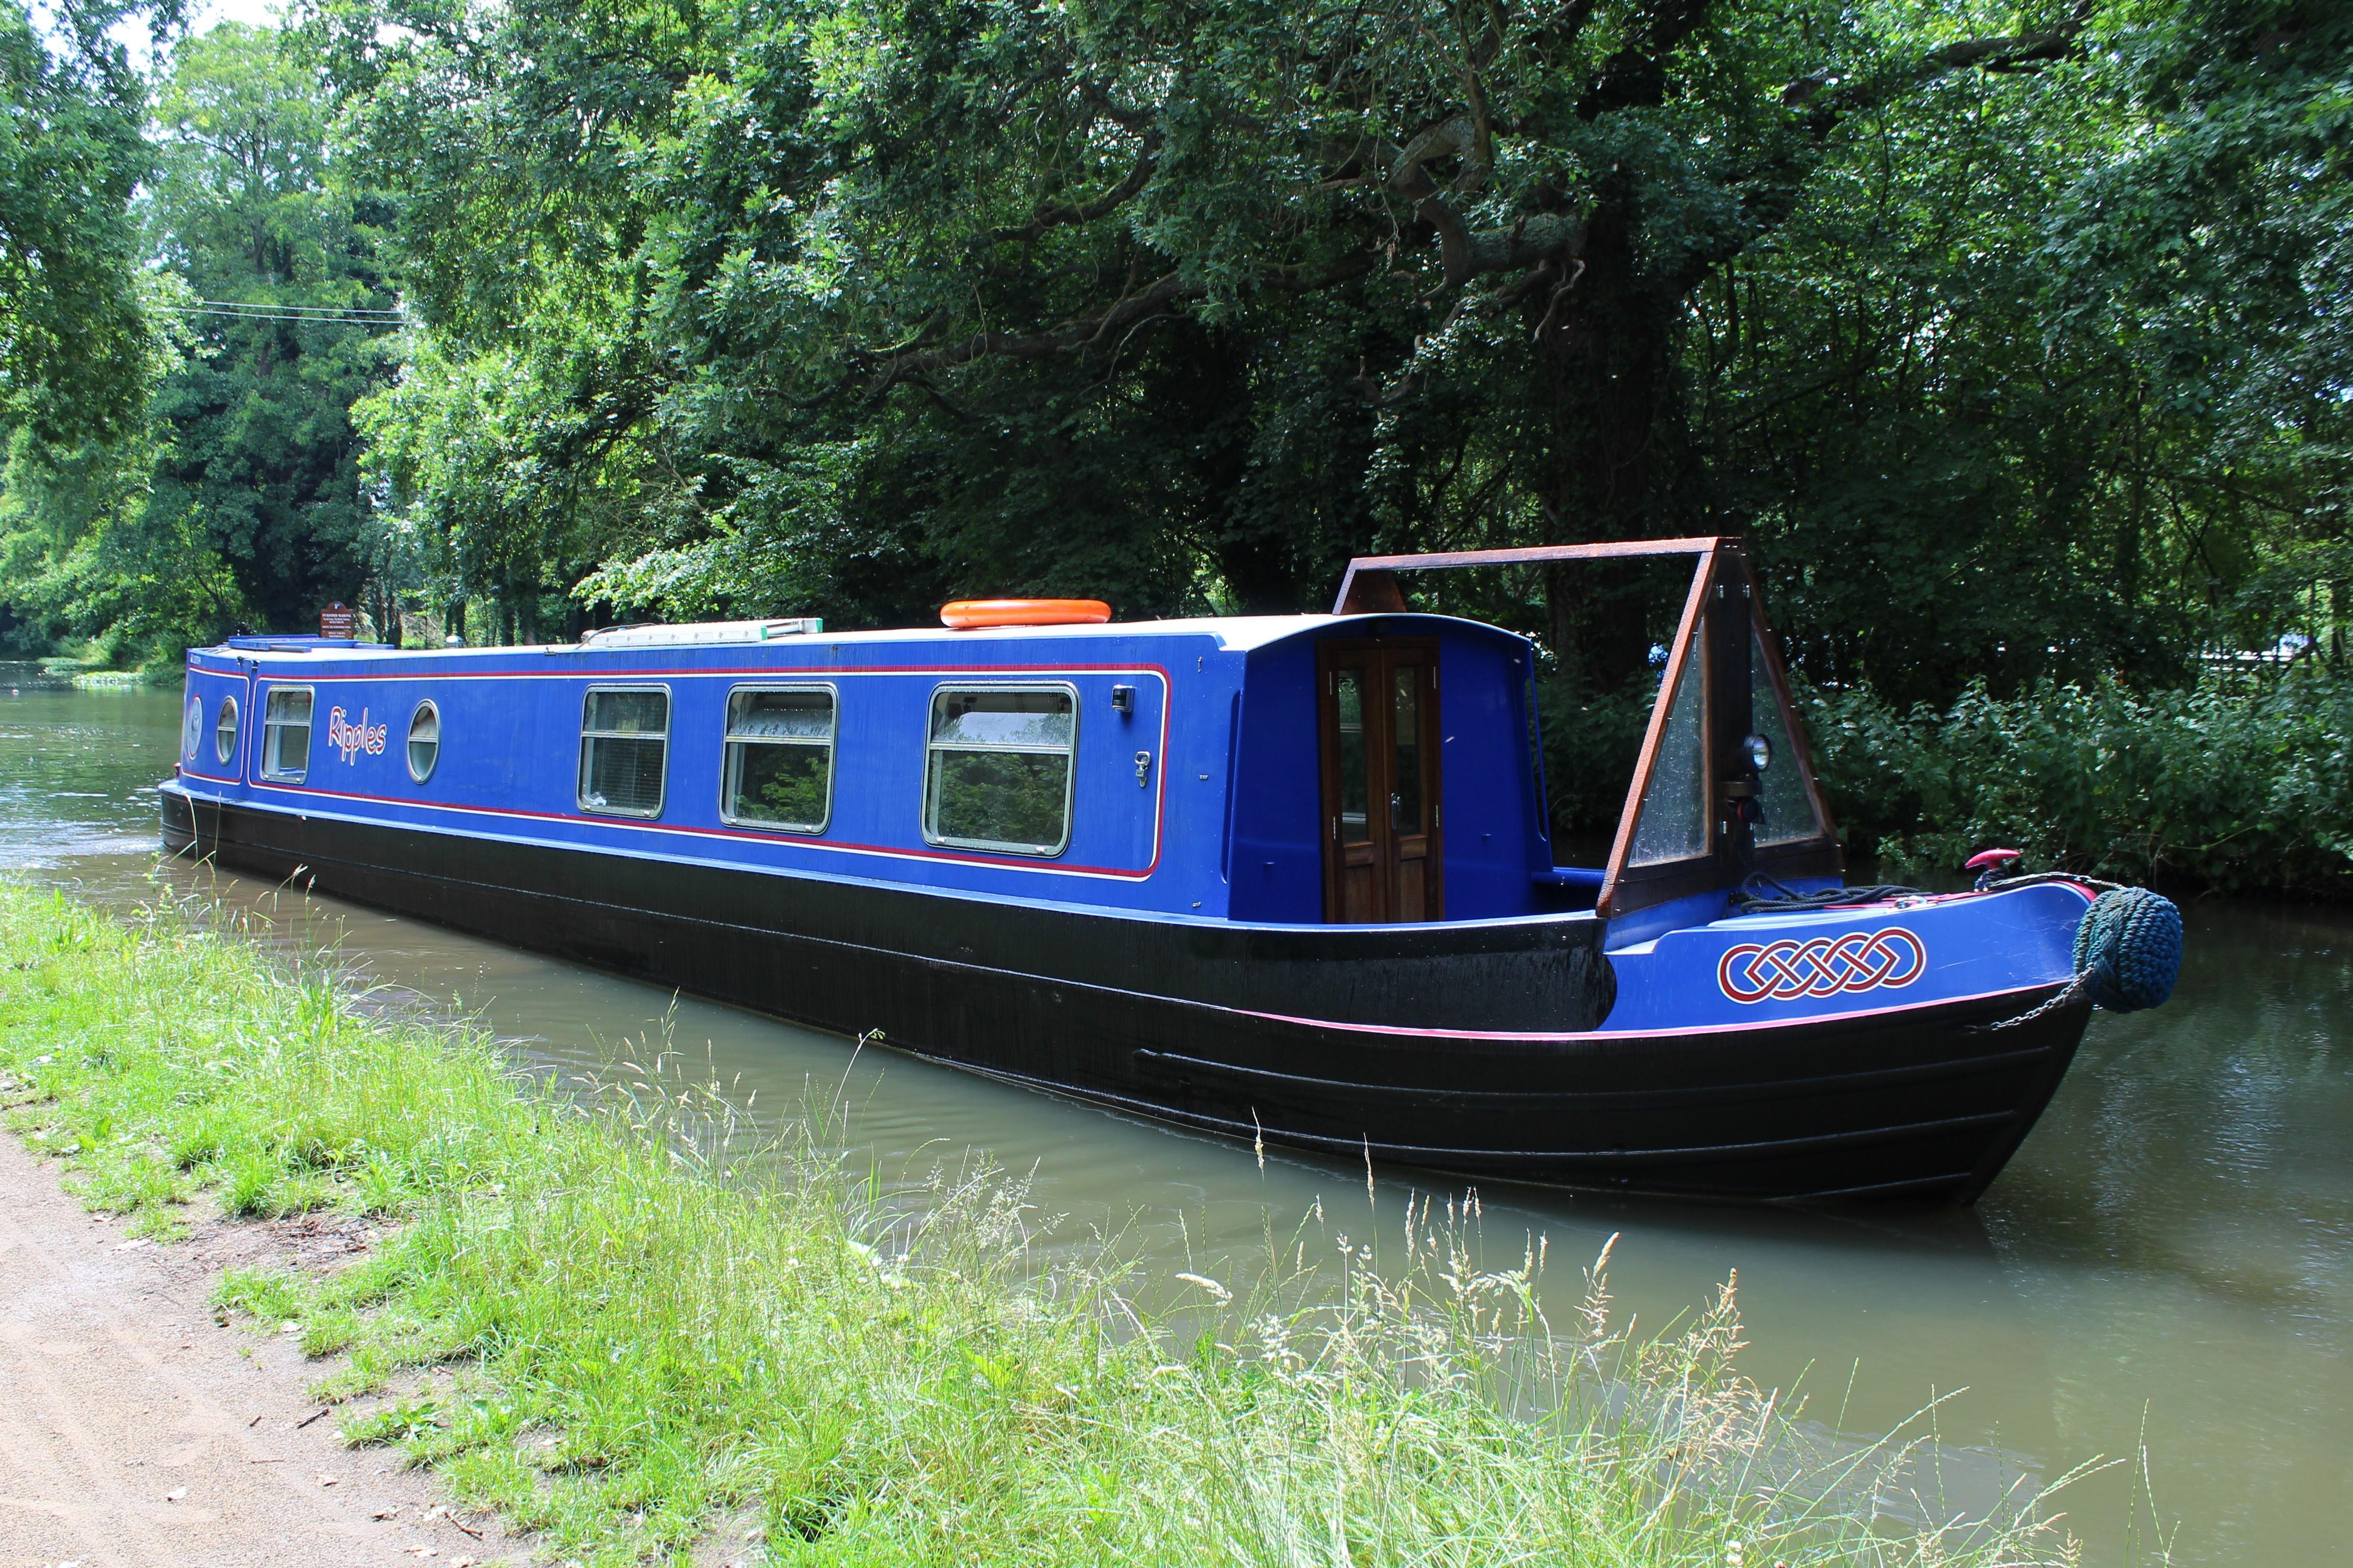 Kingsground 51' Hybrid Narrowboat